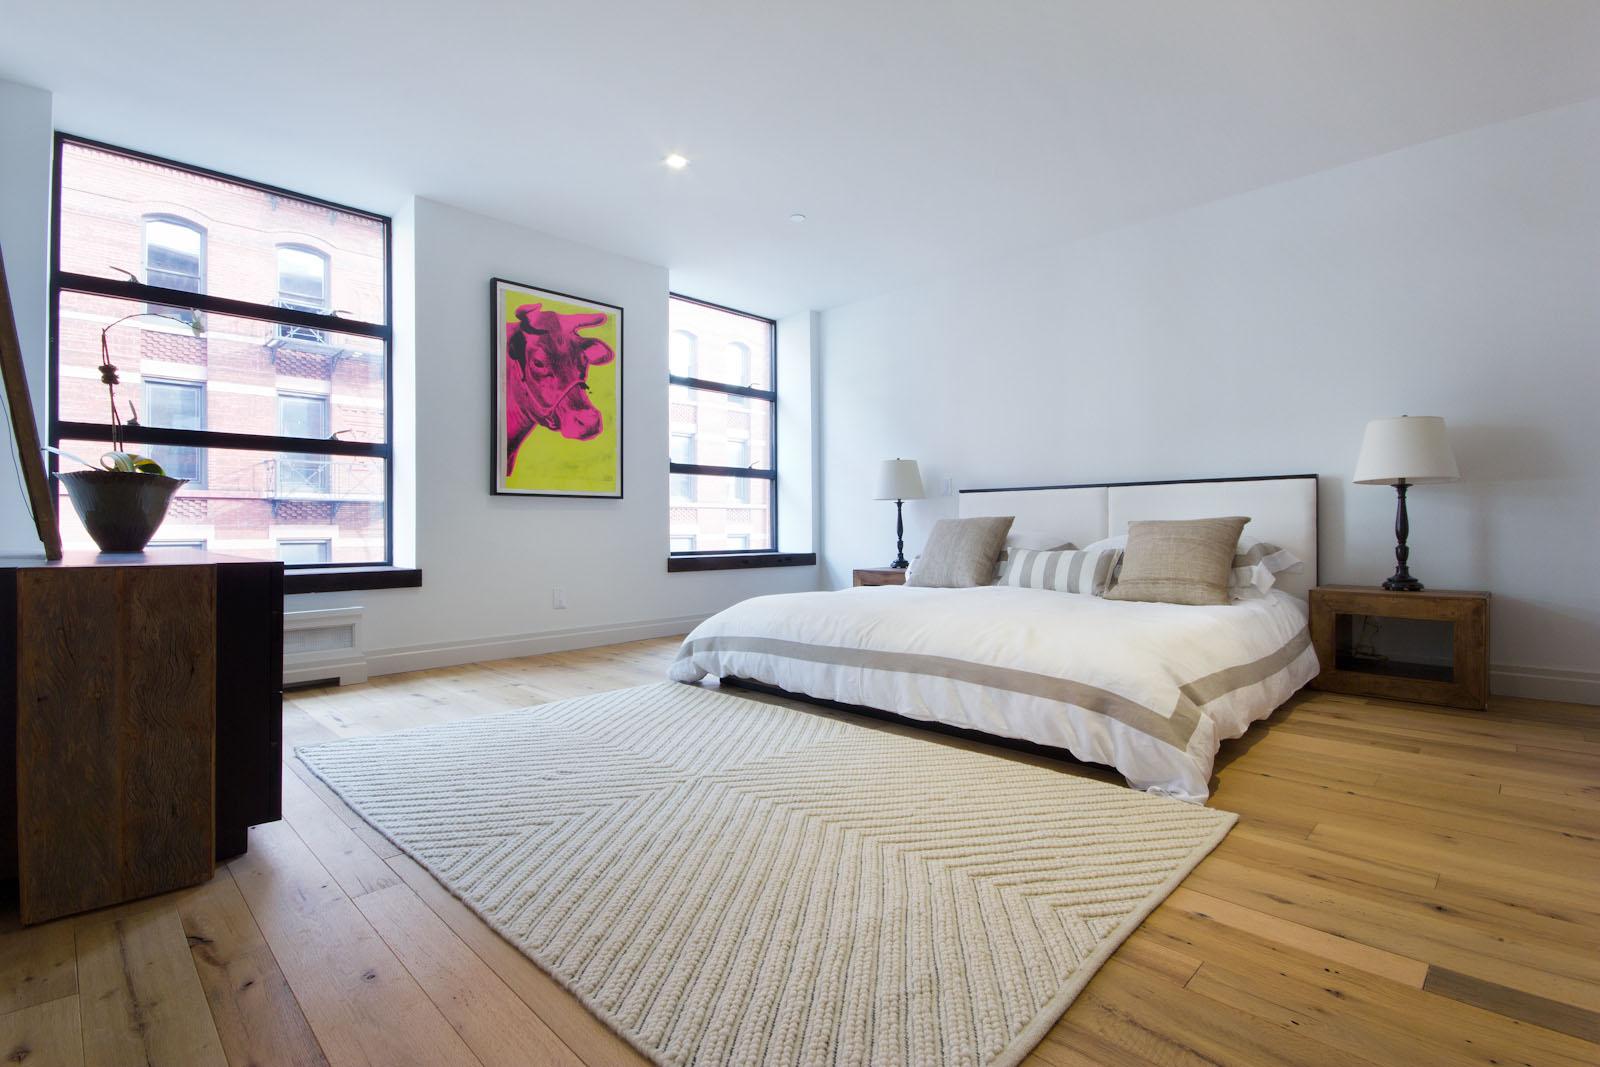 New York Bedroom Accessories Inspirational Nolita Luxury Loft In New York Idesignarch